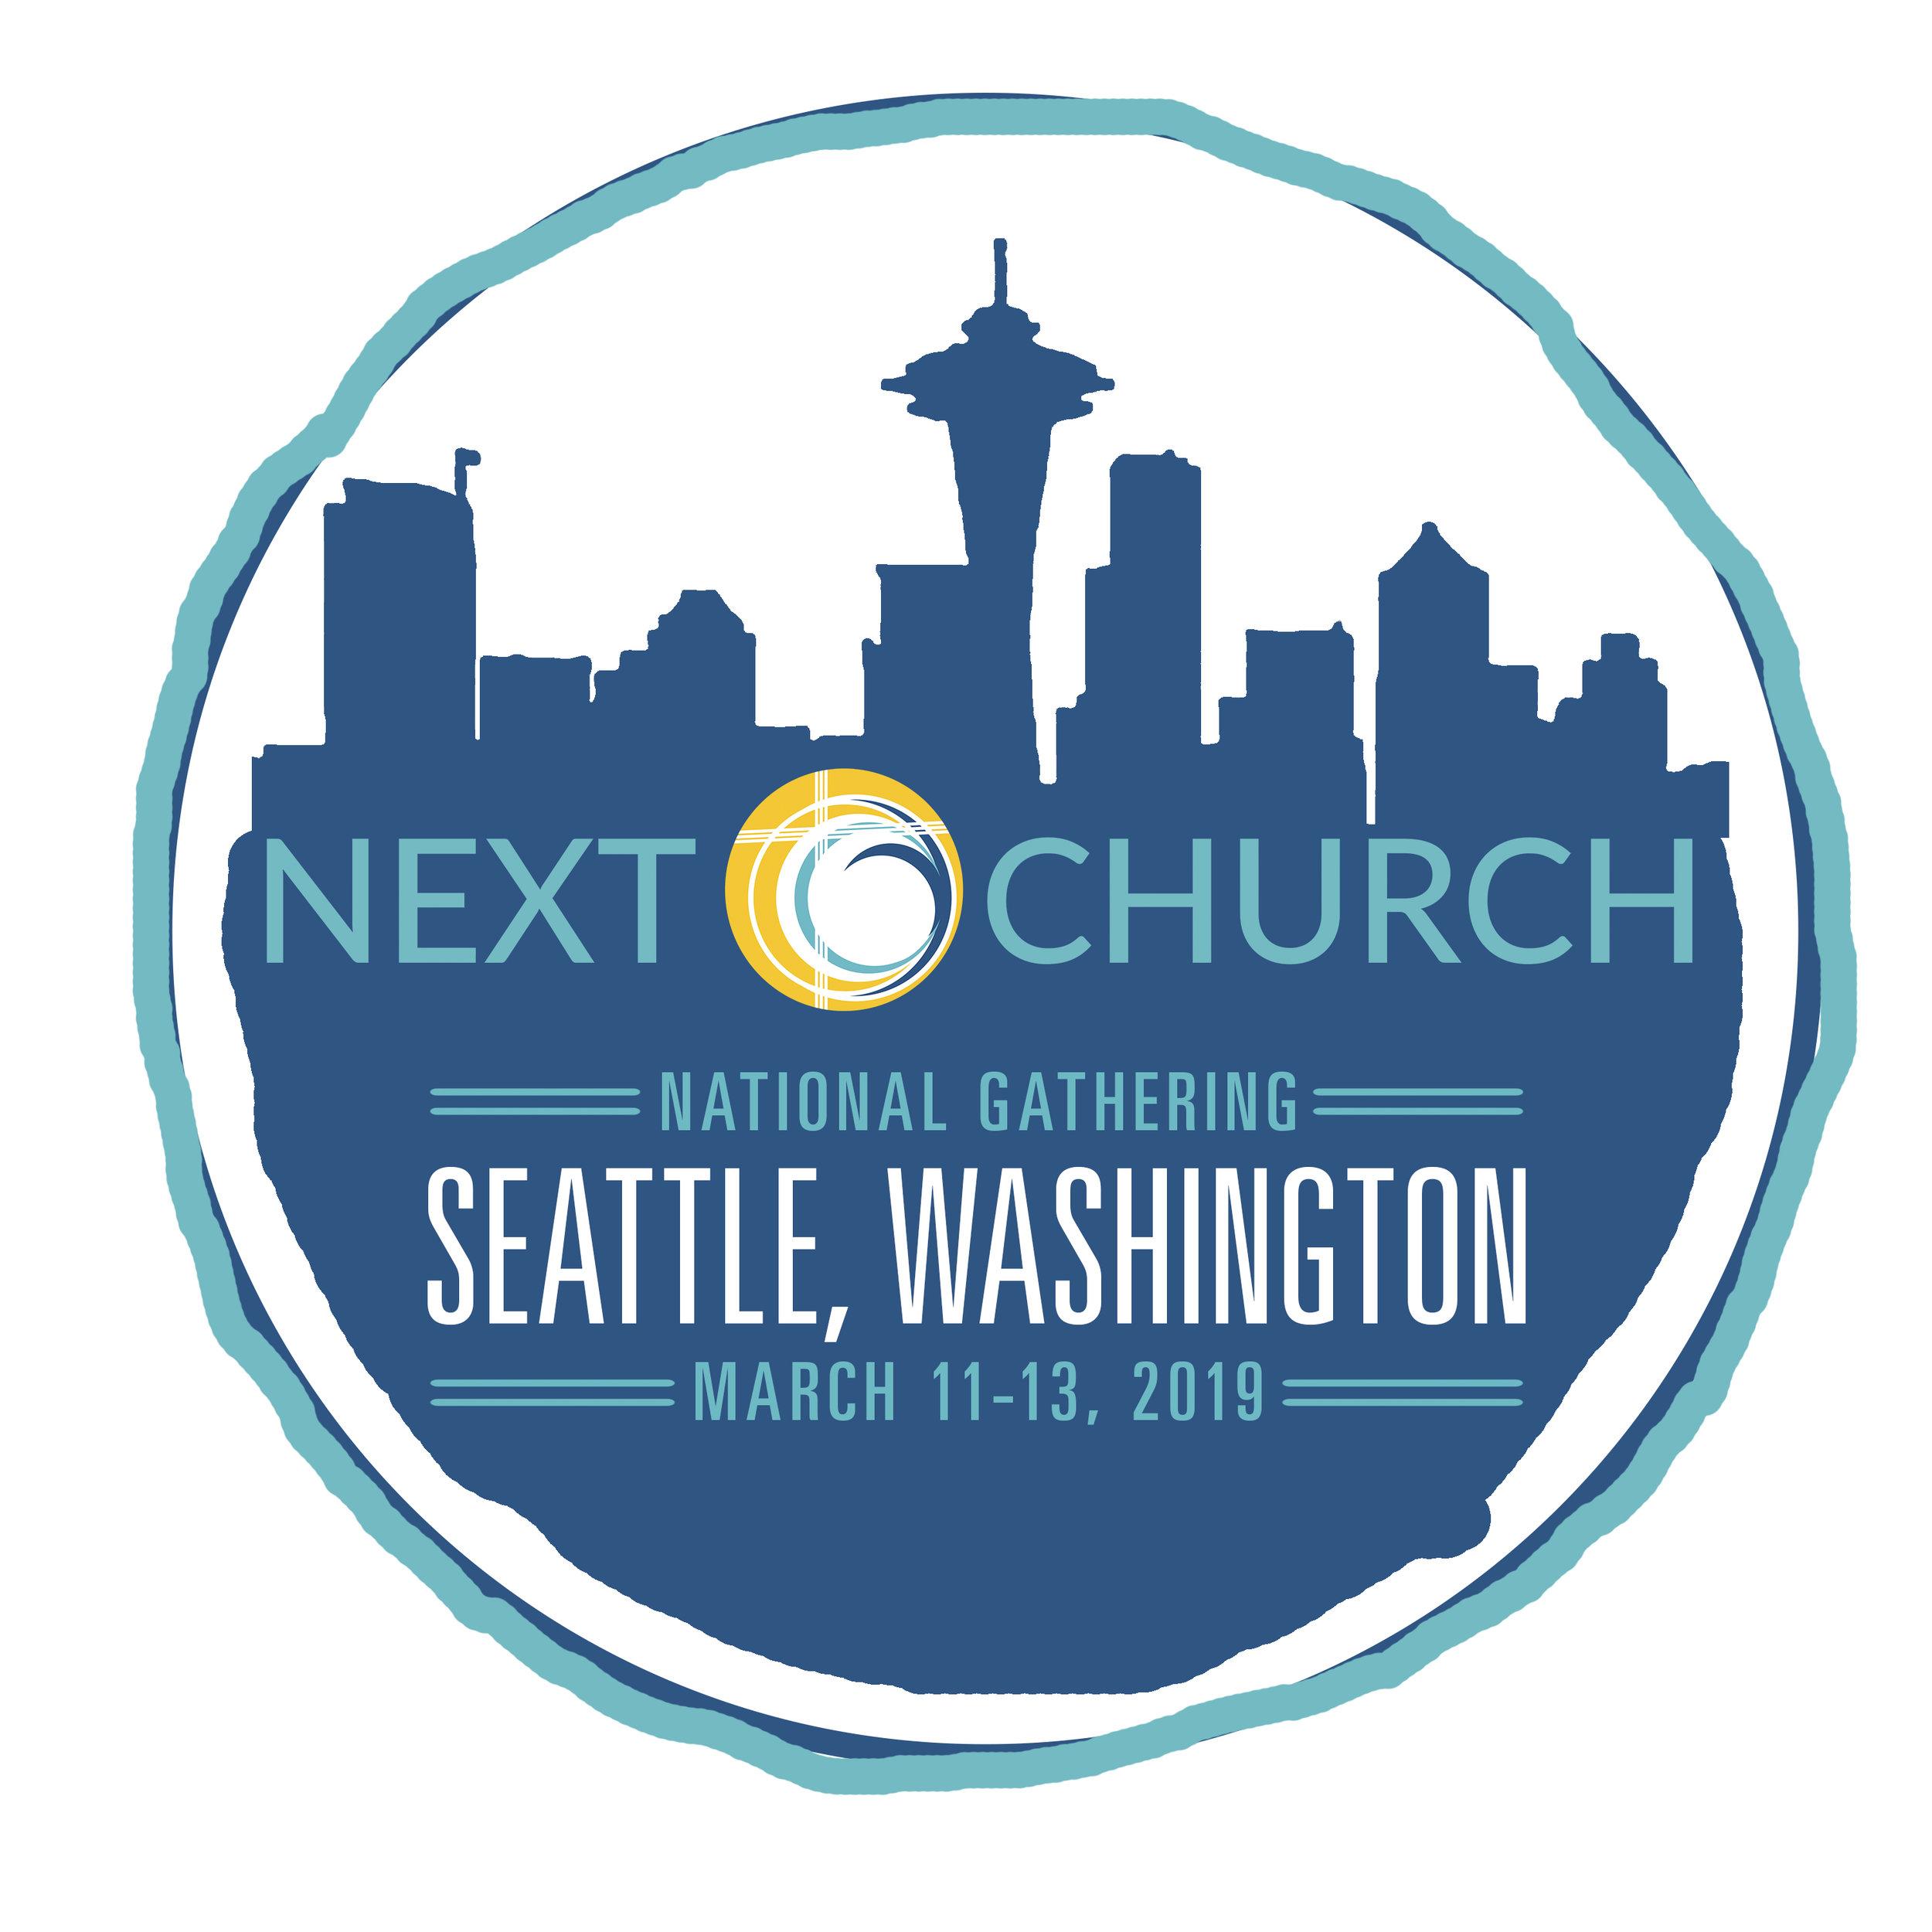 NEXT Church National Gathering Seattle.jpg